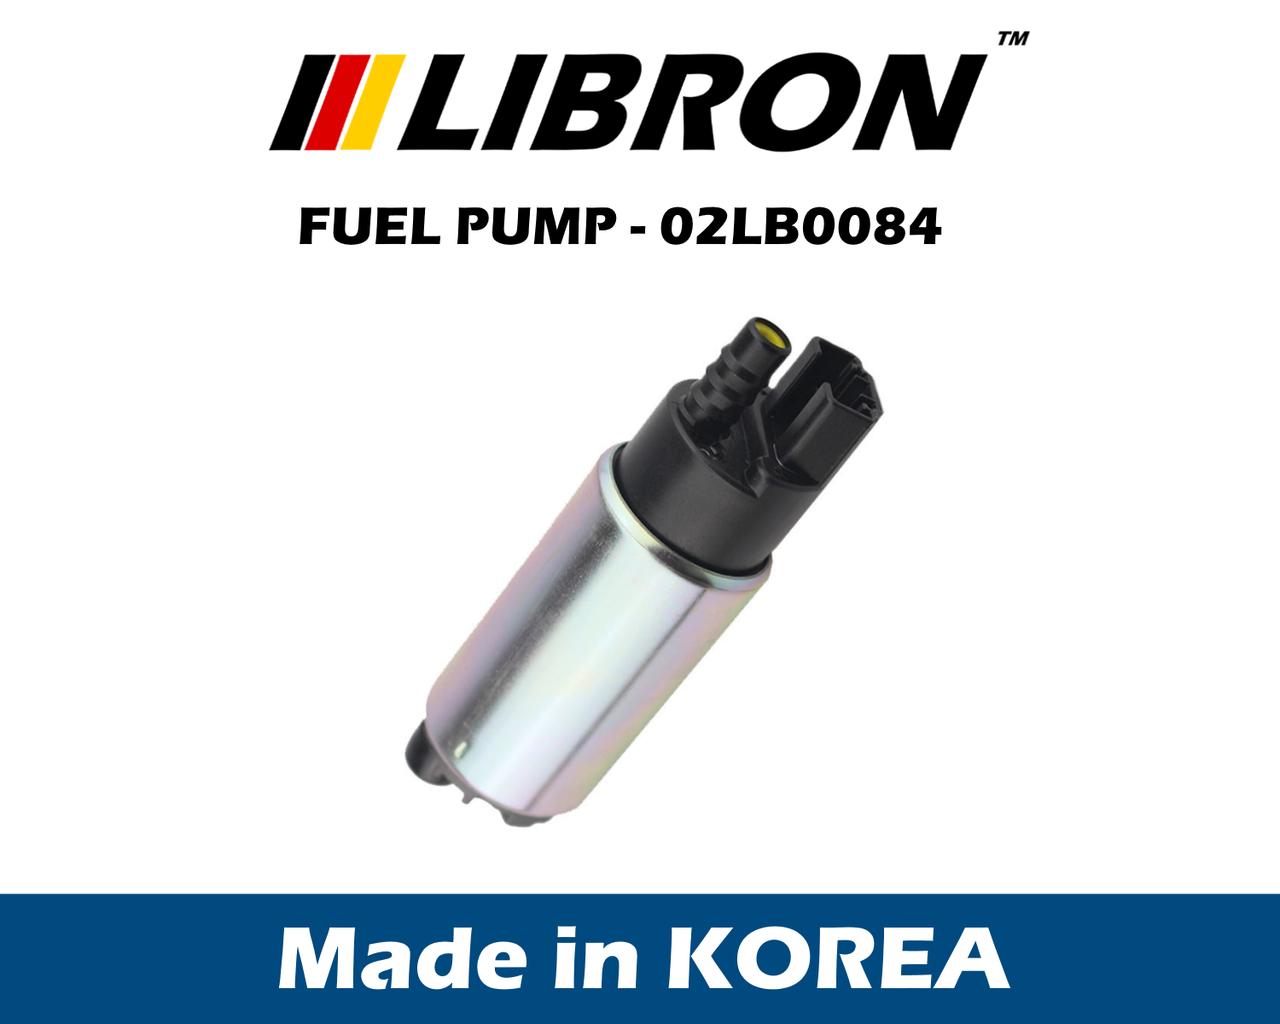 Топливный насос LIBRON 02LB0084 - HONDA ACCORD V Aerodeck